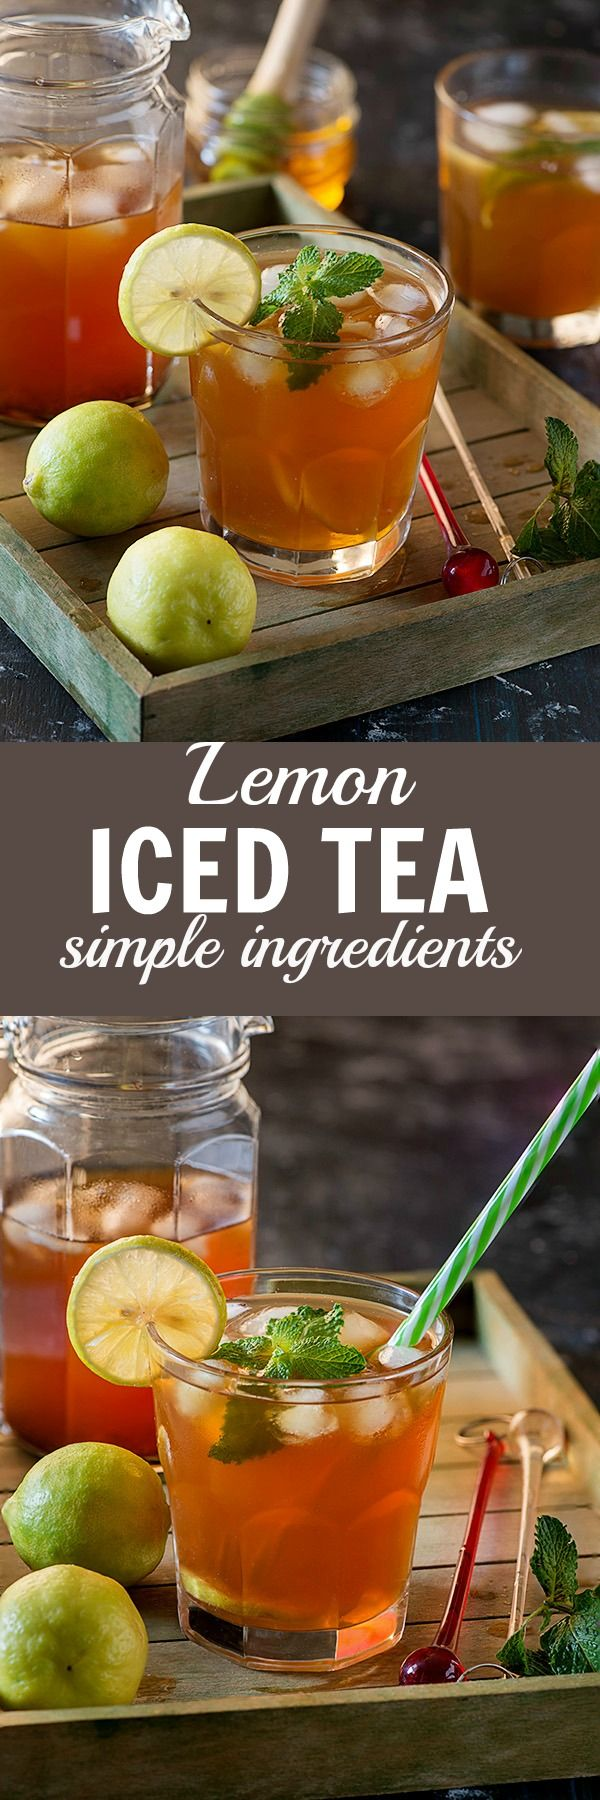 Perfect Iced Tea Recipe – Basic Iced Tea Pitcher at Home